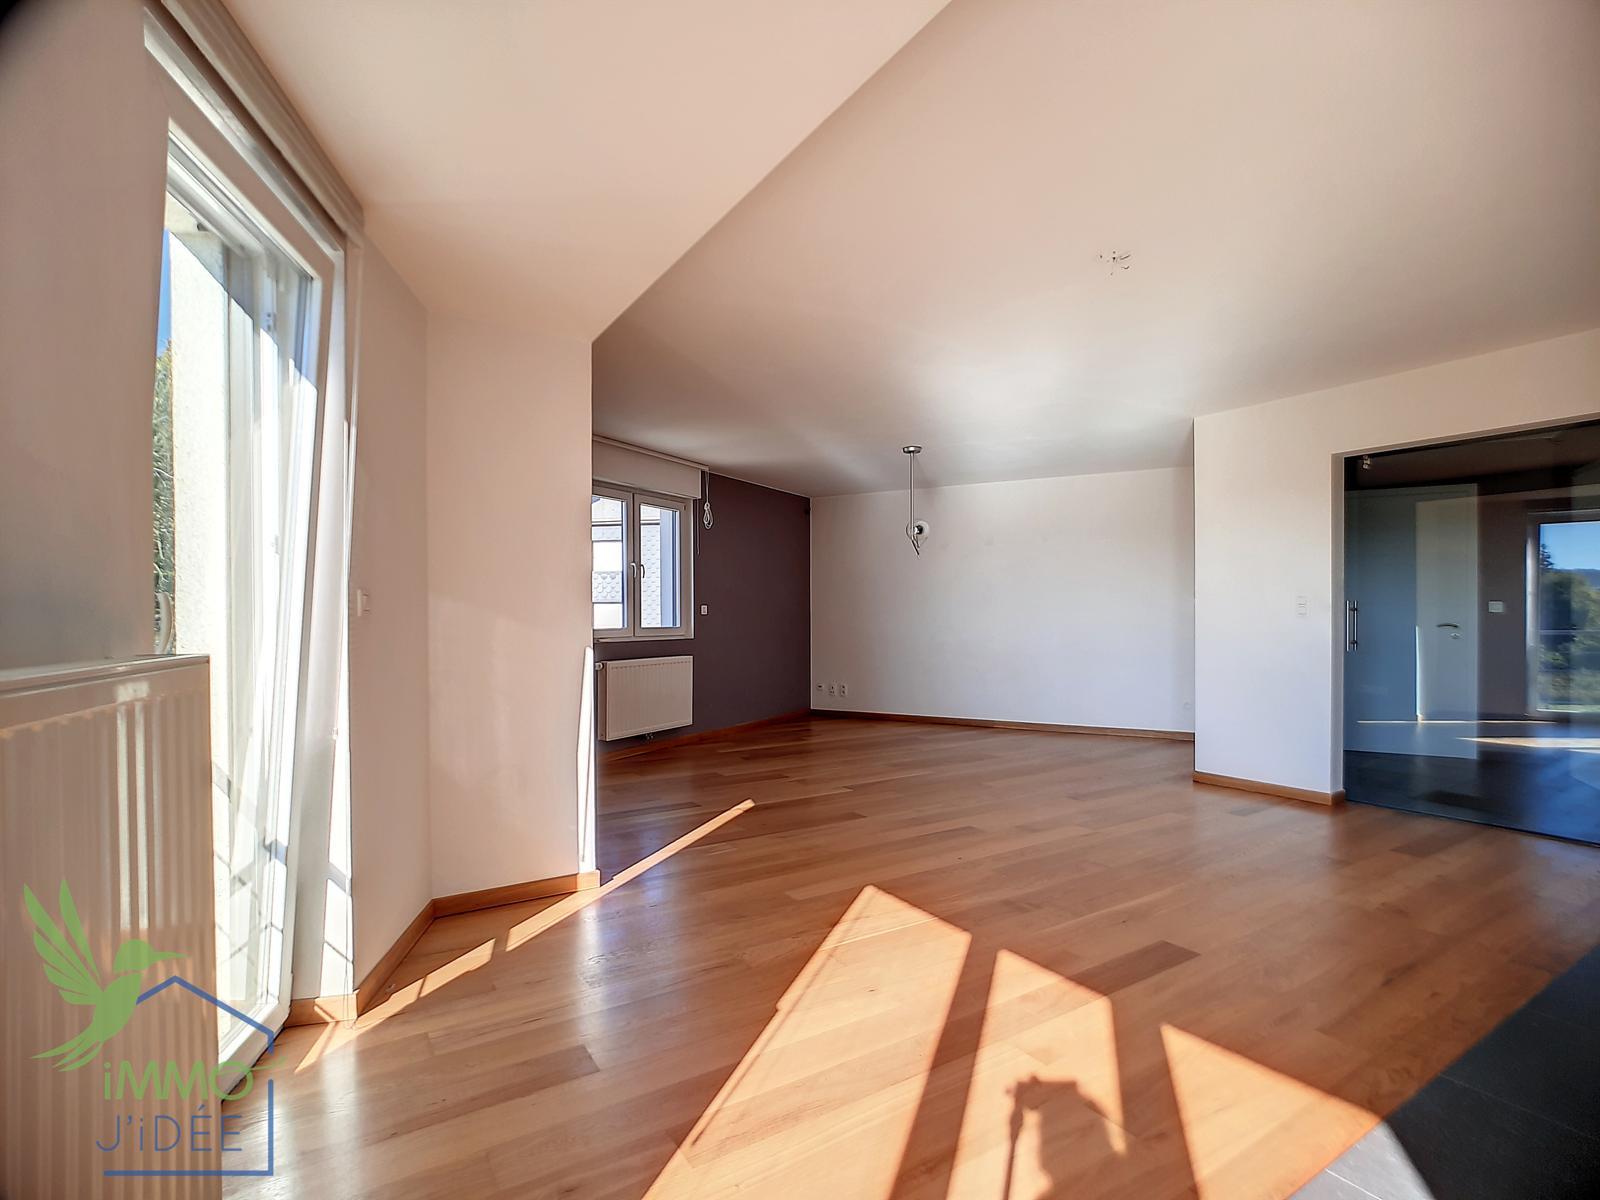 Appartement - Arlon - #4533660-2